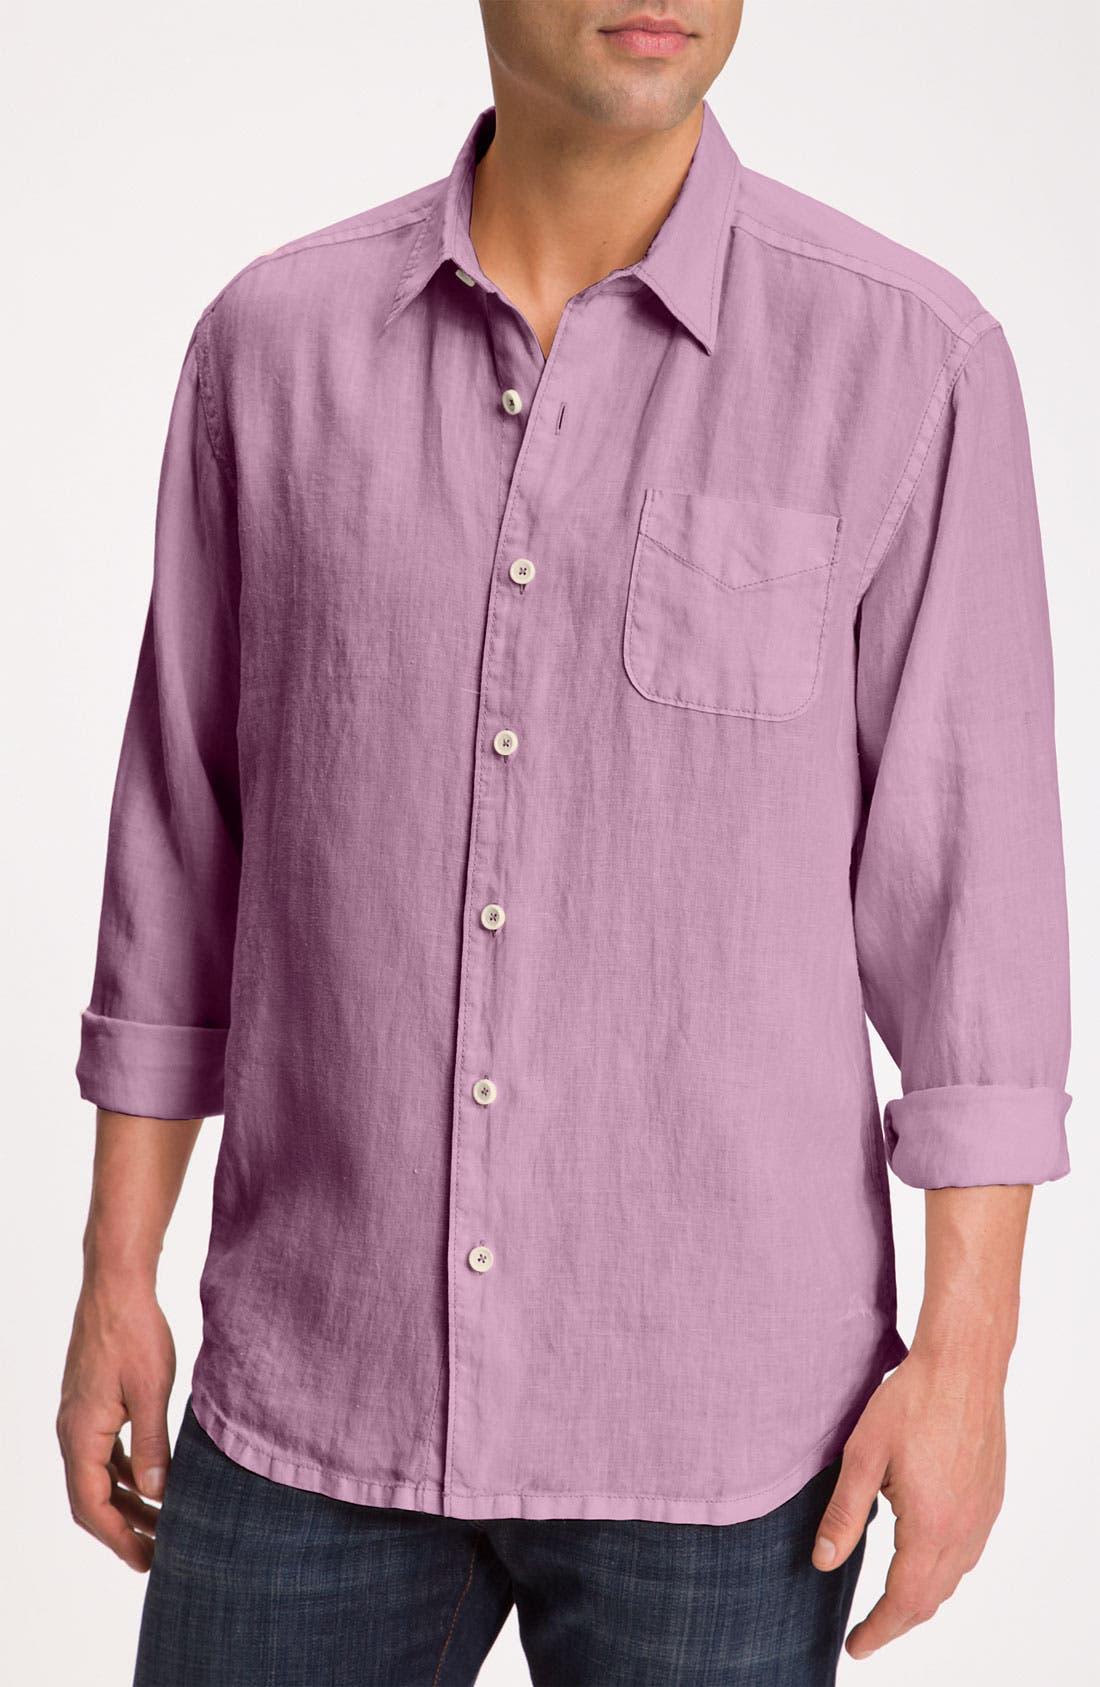 Main Image - Tommy Bahama 'Beachy Breezer' Linen Sport Shirt